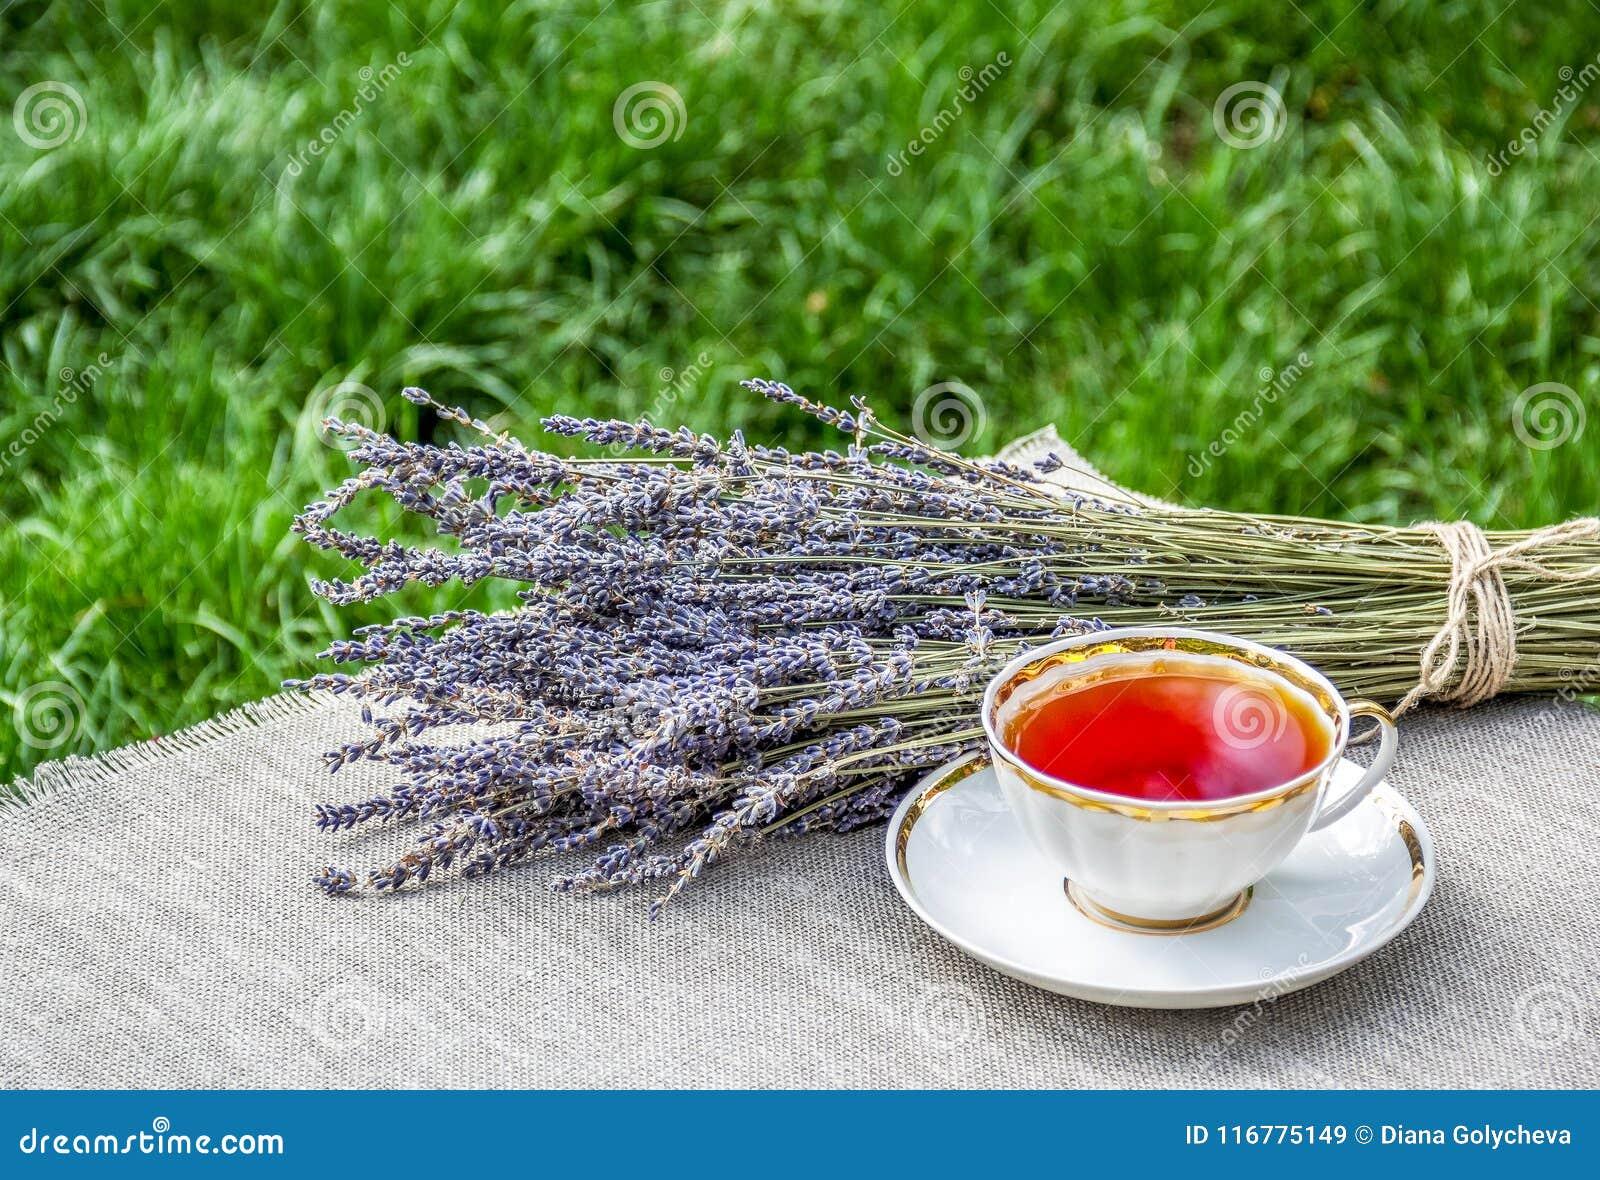 Is tea useful? 80